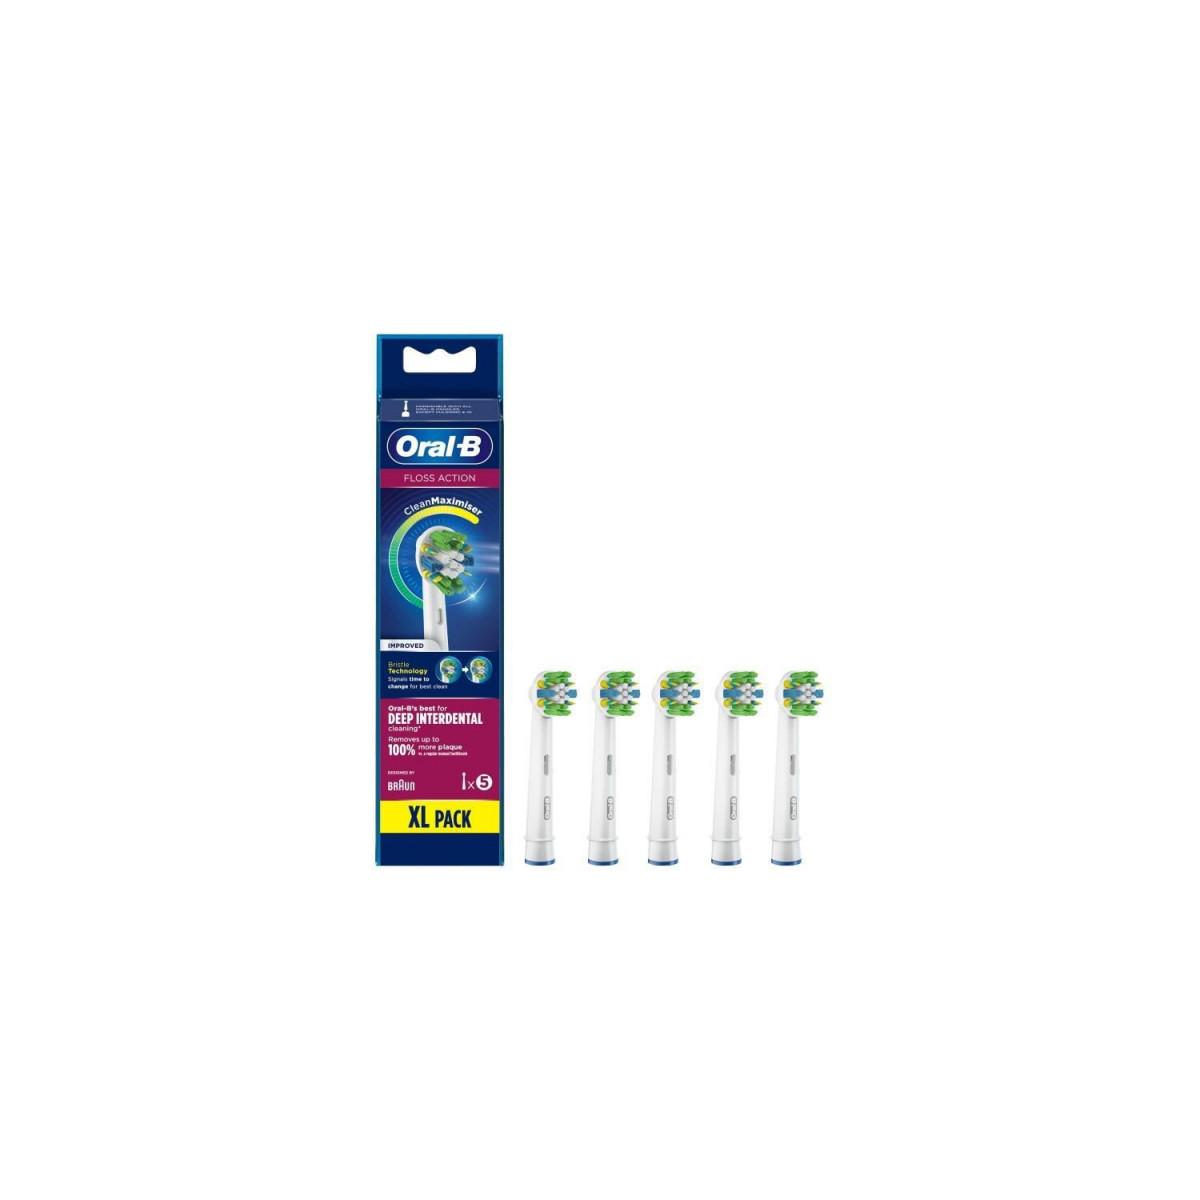 Oral-B Oral-B FlossAction Brossette Avec CleanMaximiser, 5